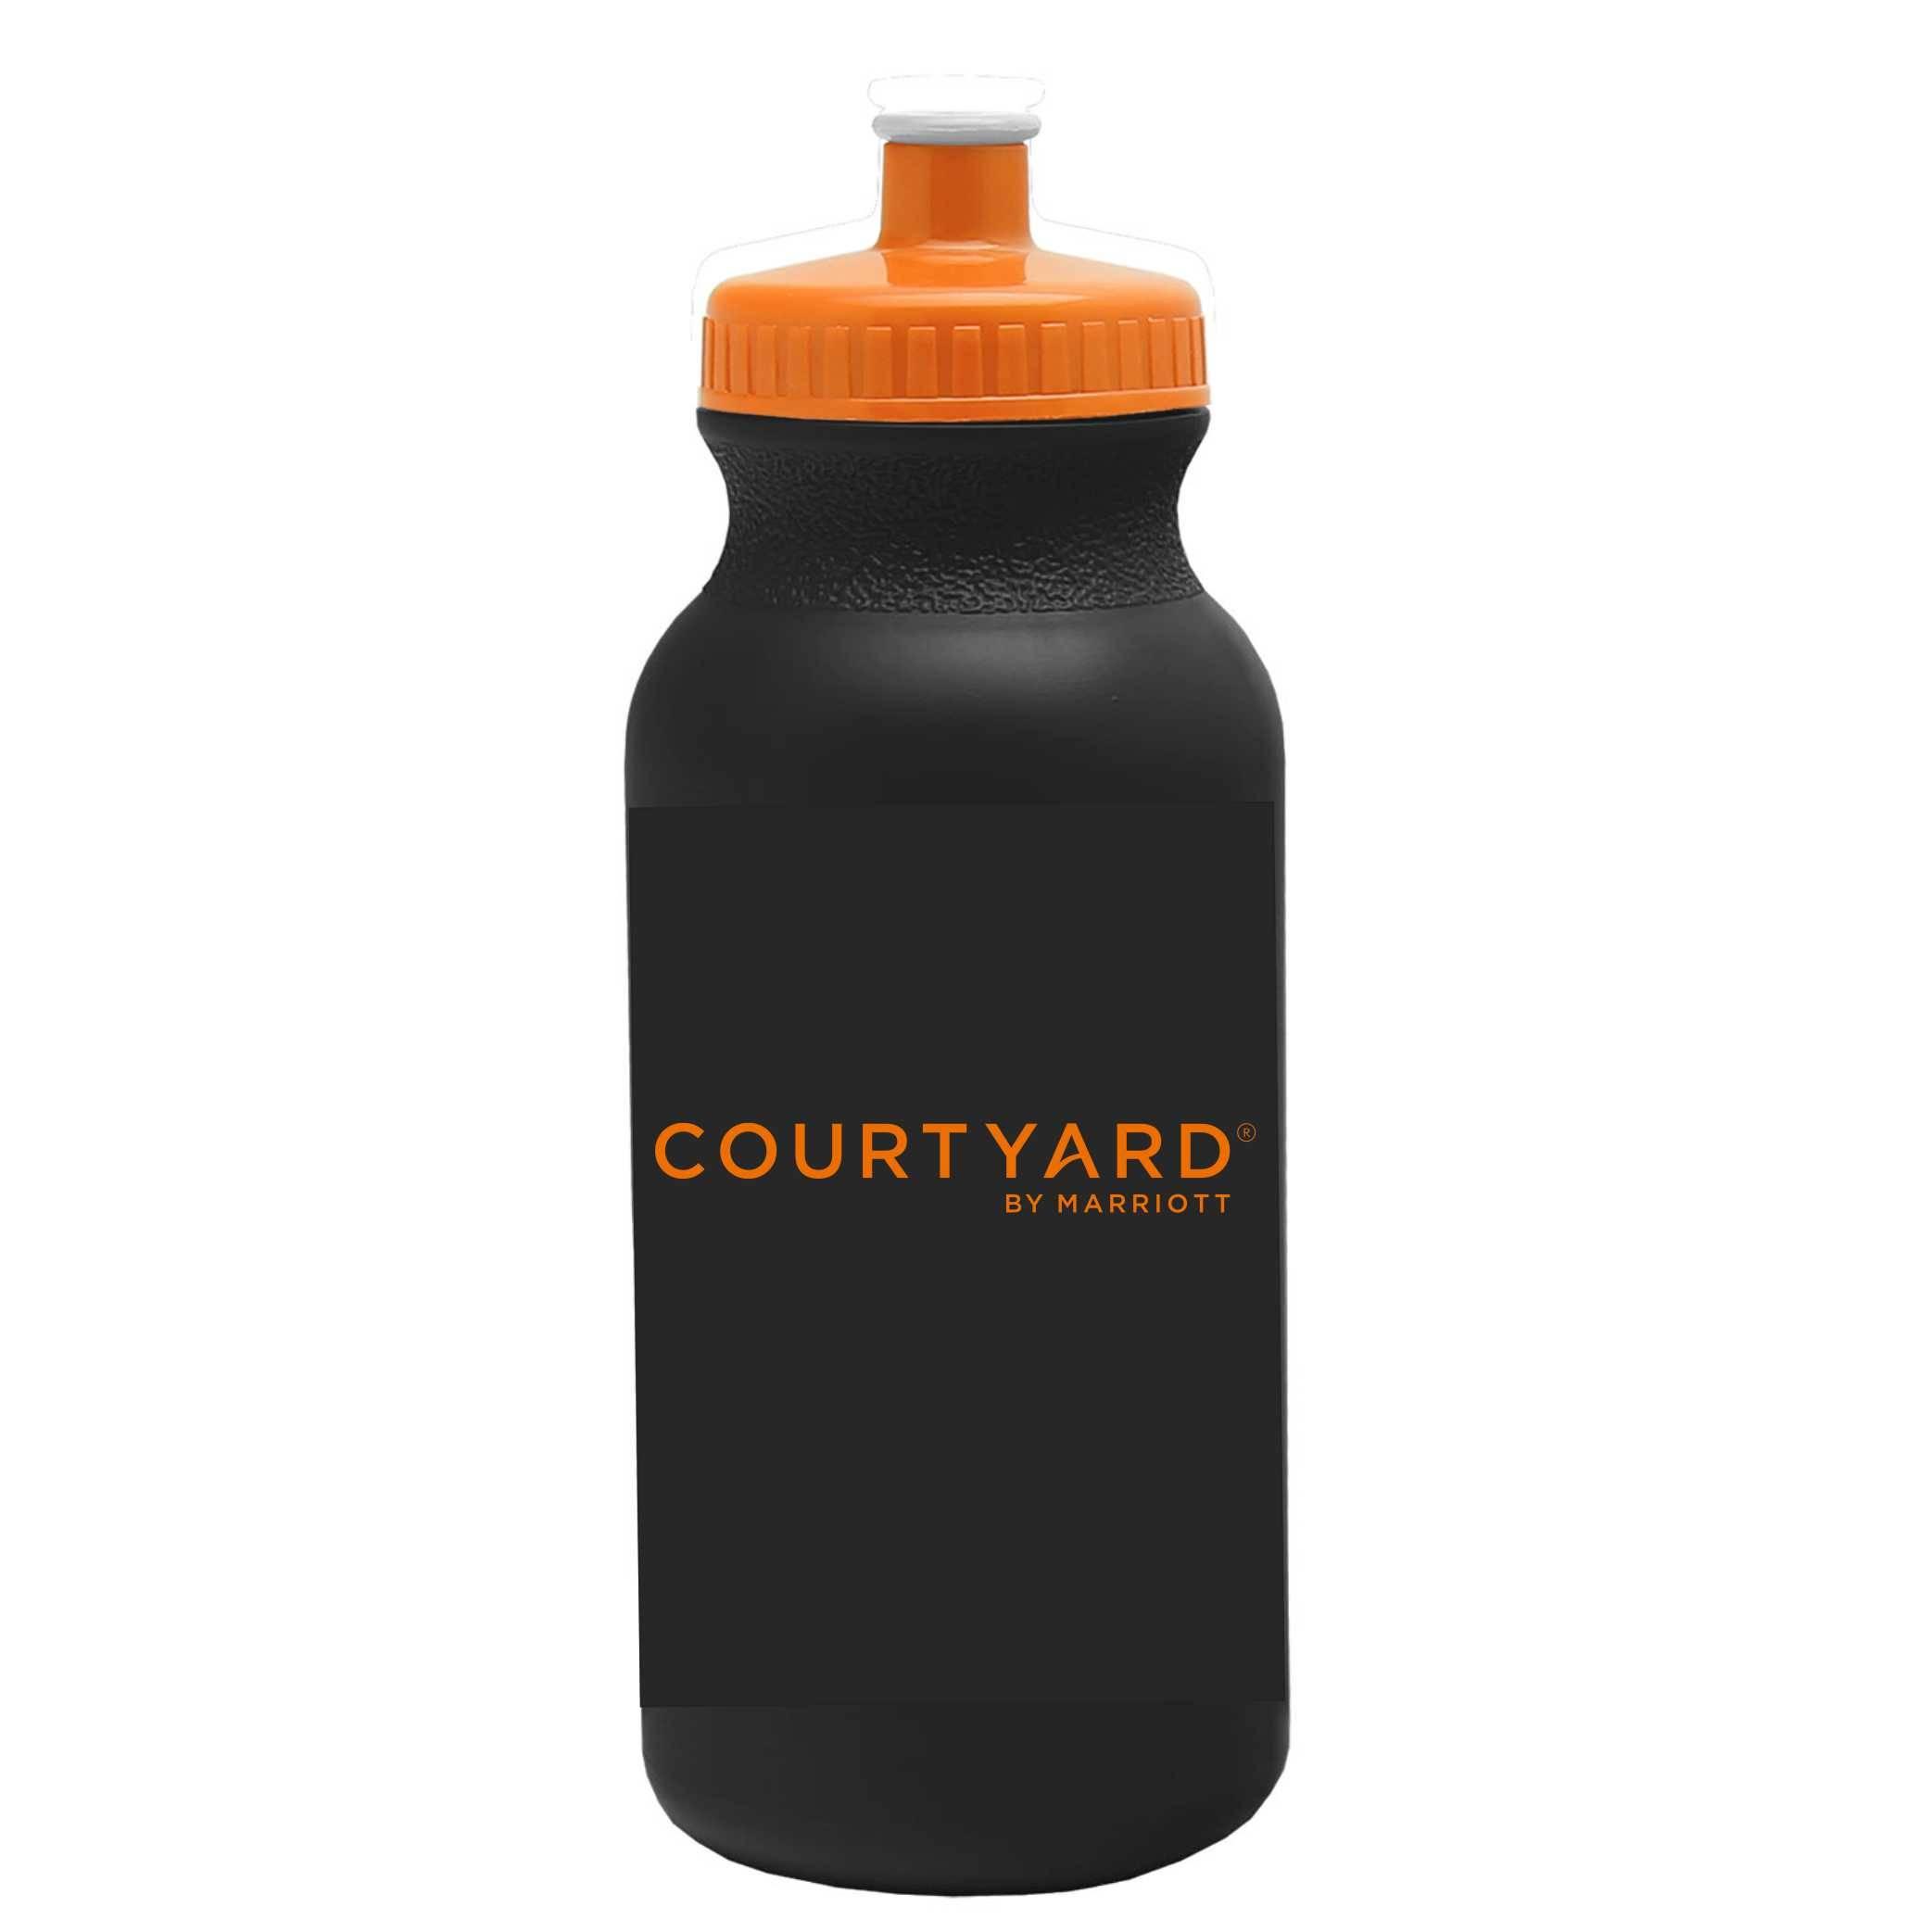 Sport Bottles. 20oz. | 2 Sided Logo | Push-Pull Cap | BPA Free & FDA Compliant | Dishwasher Safe